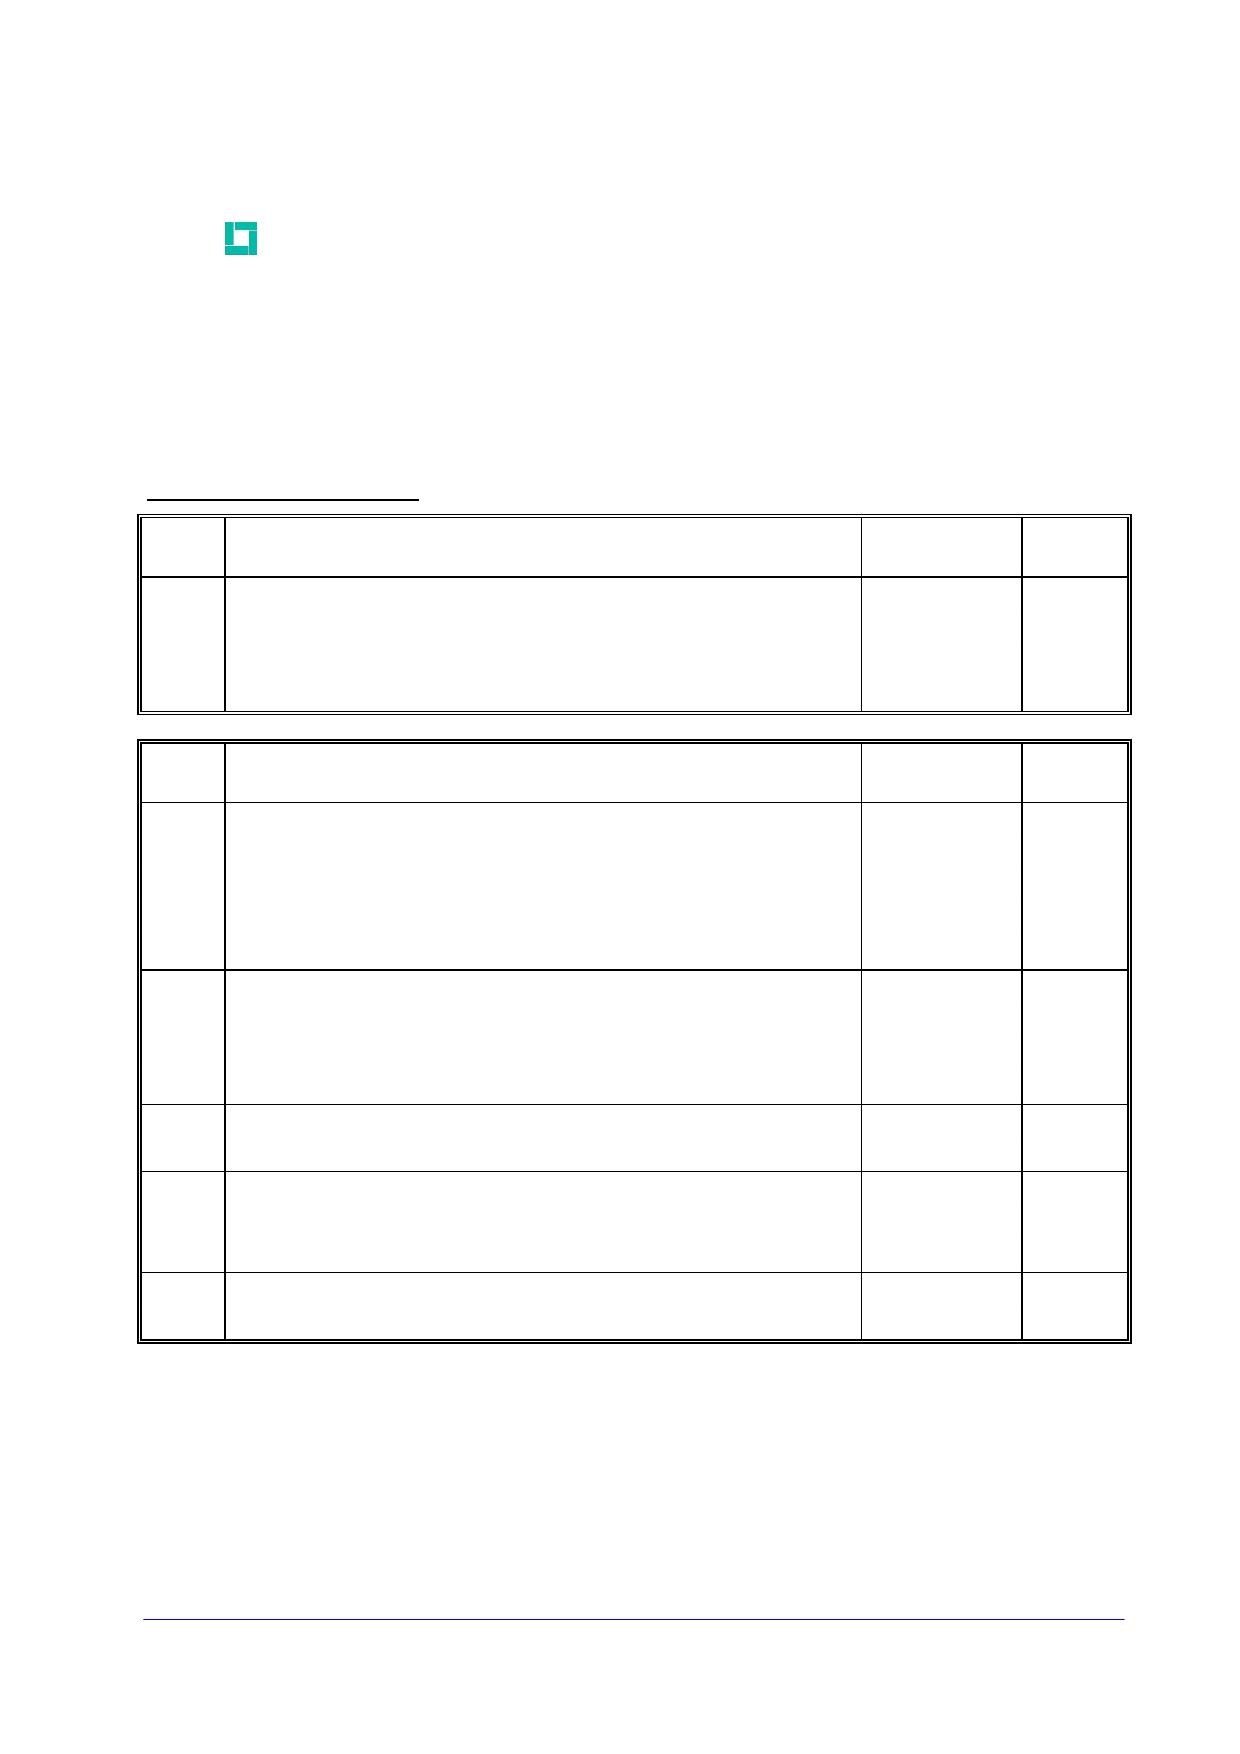 K0769NC640 datasheet